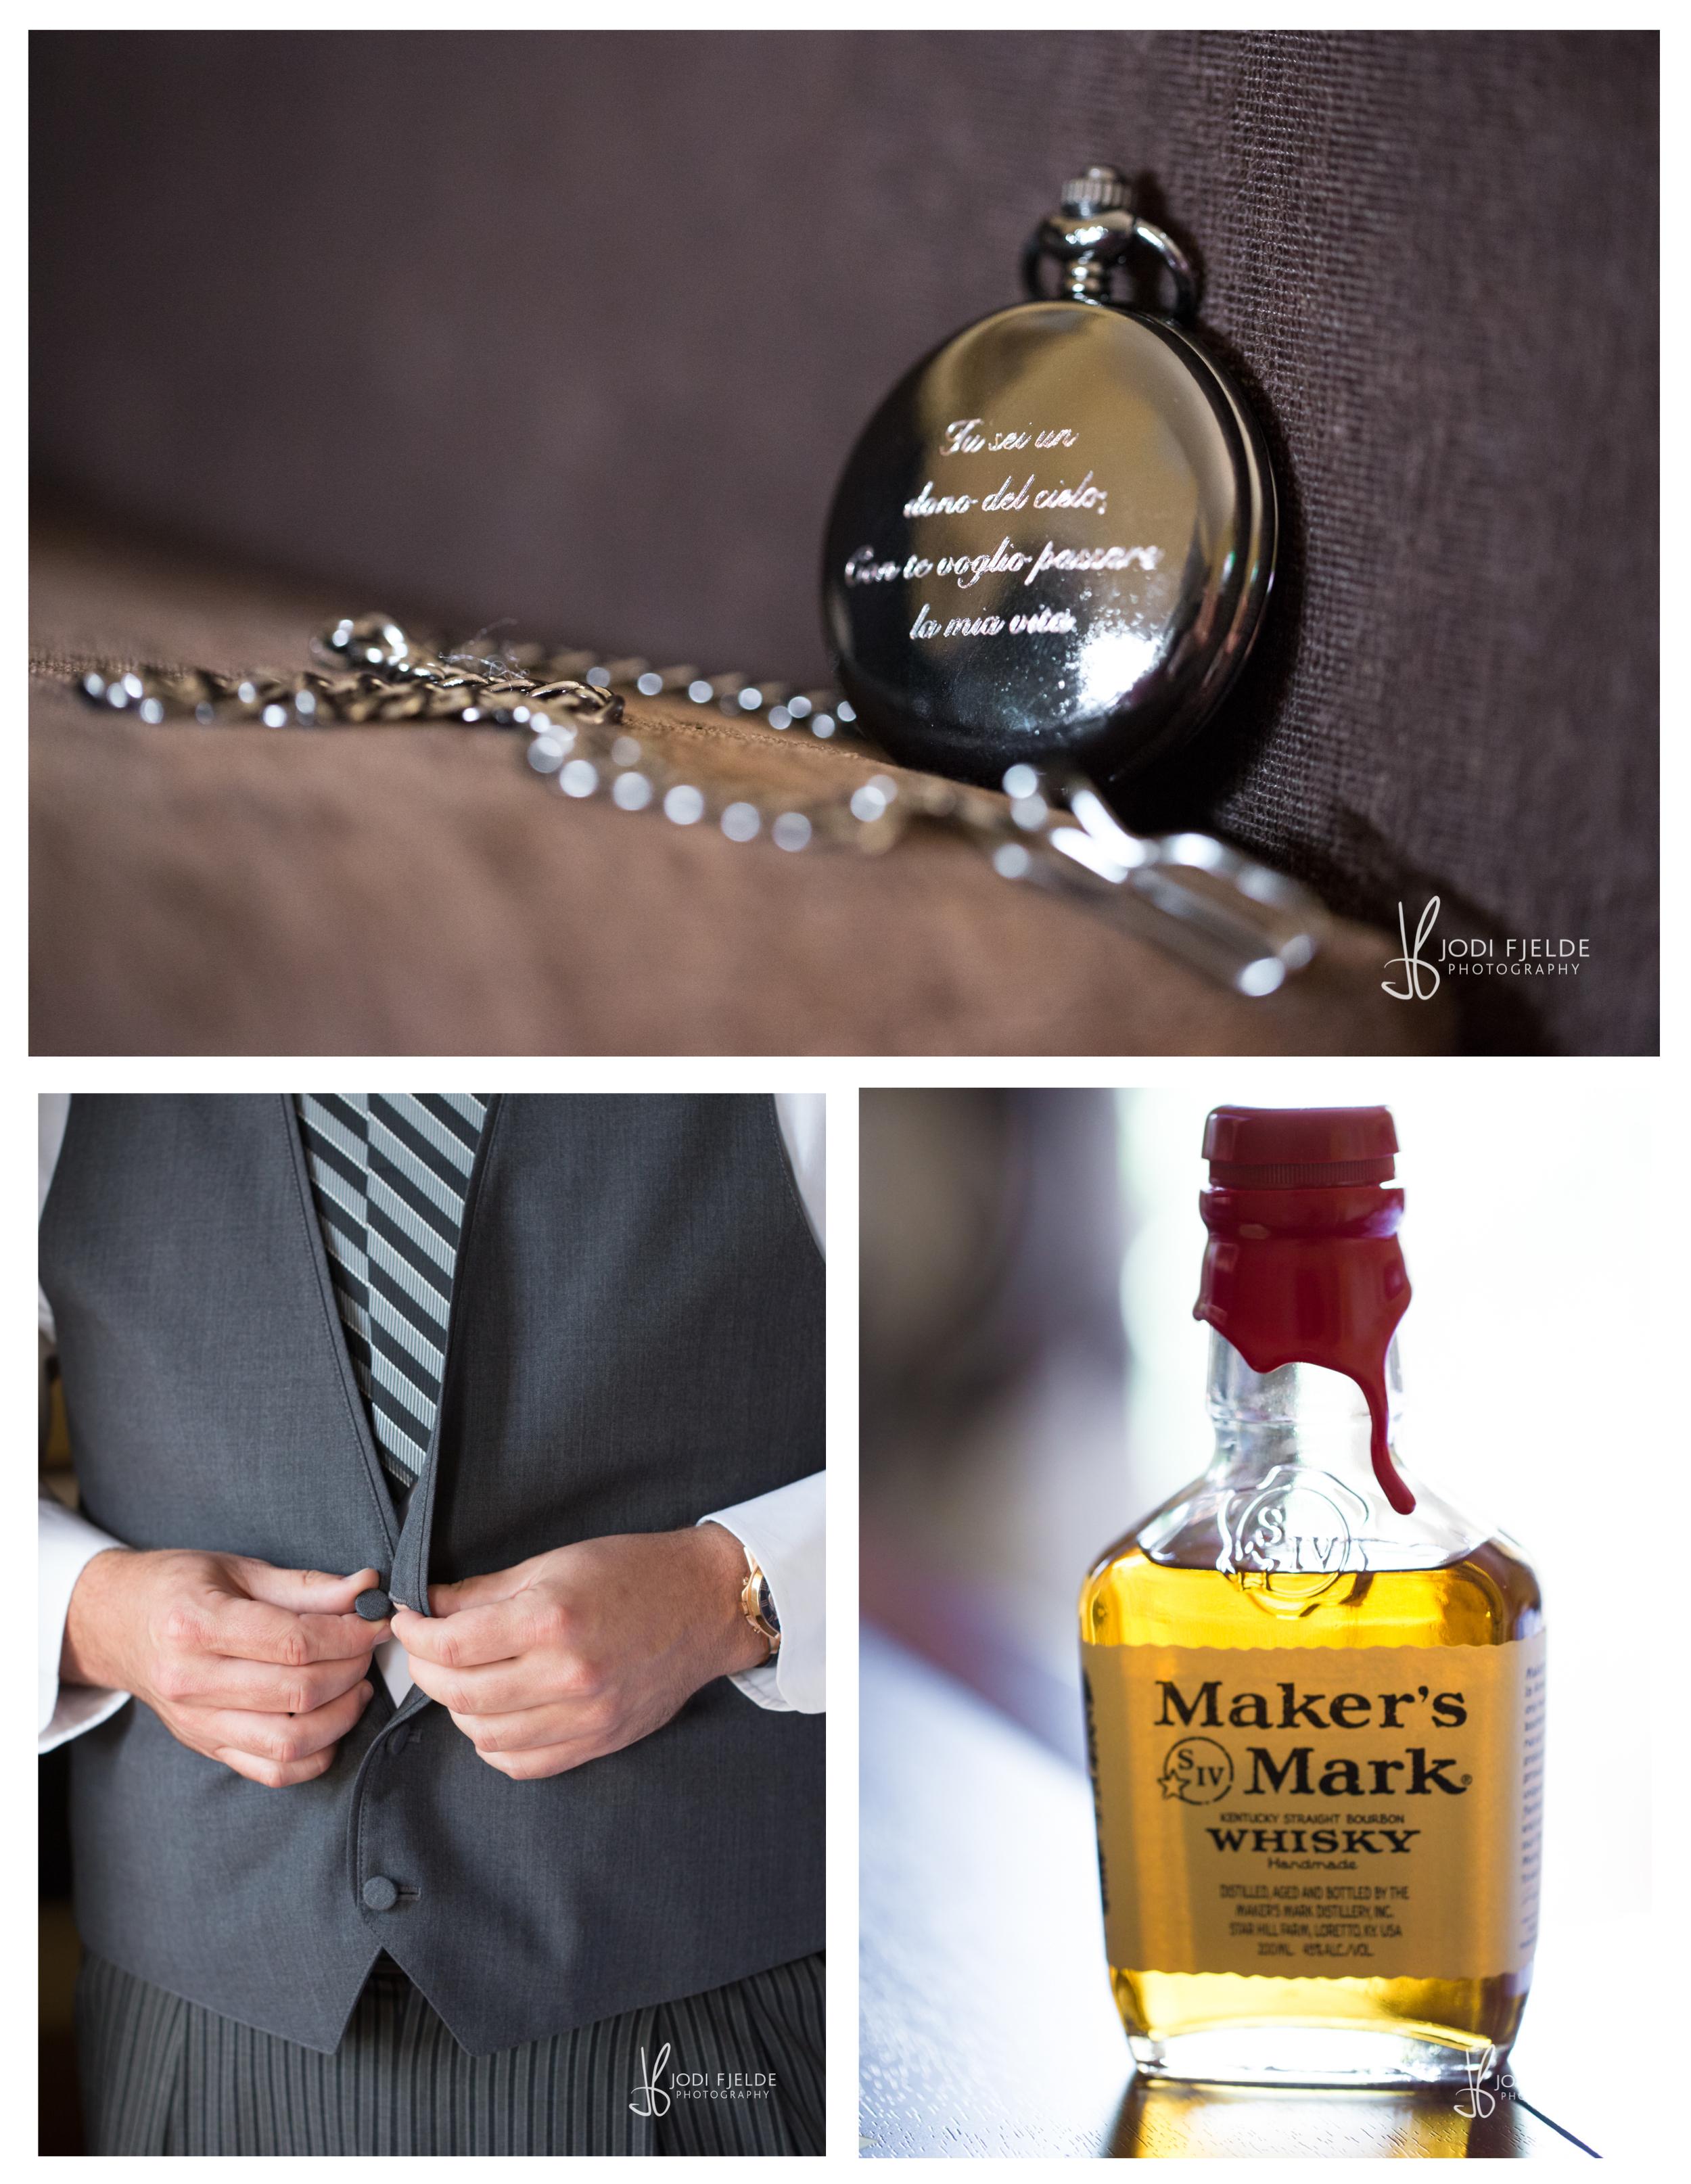 Highland_Manor_Apopka_Florida_wedding_Jackie_&_Tim_photography_jodi_Fjelde_photography-6.jpg